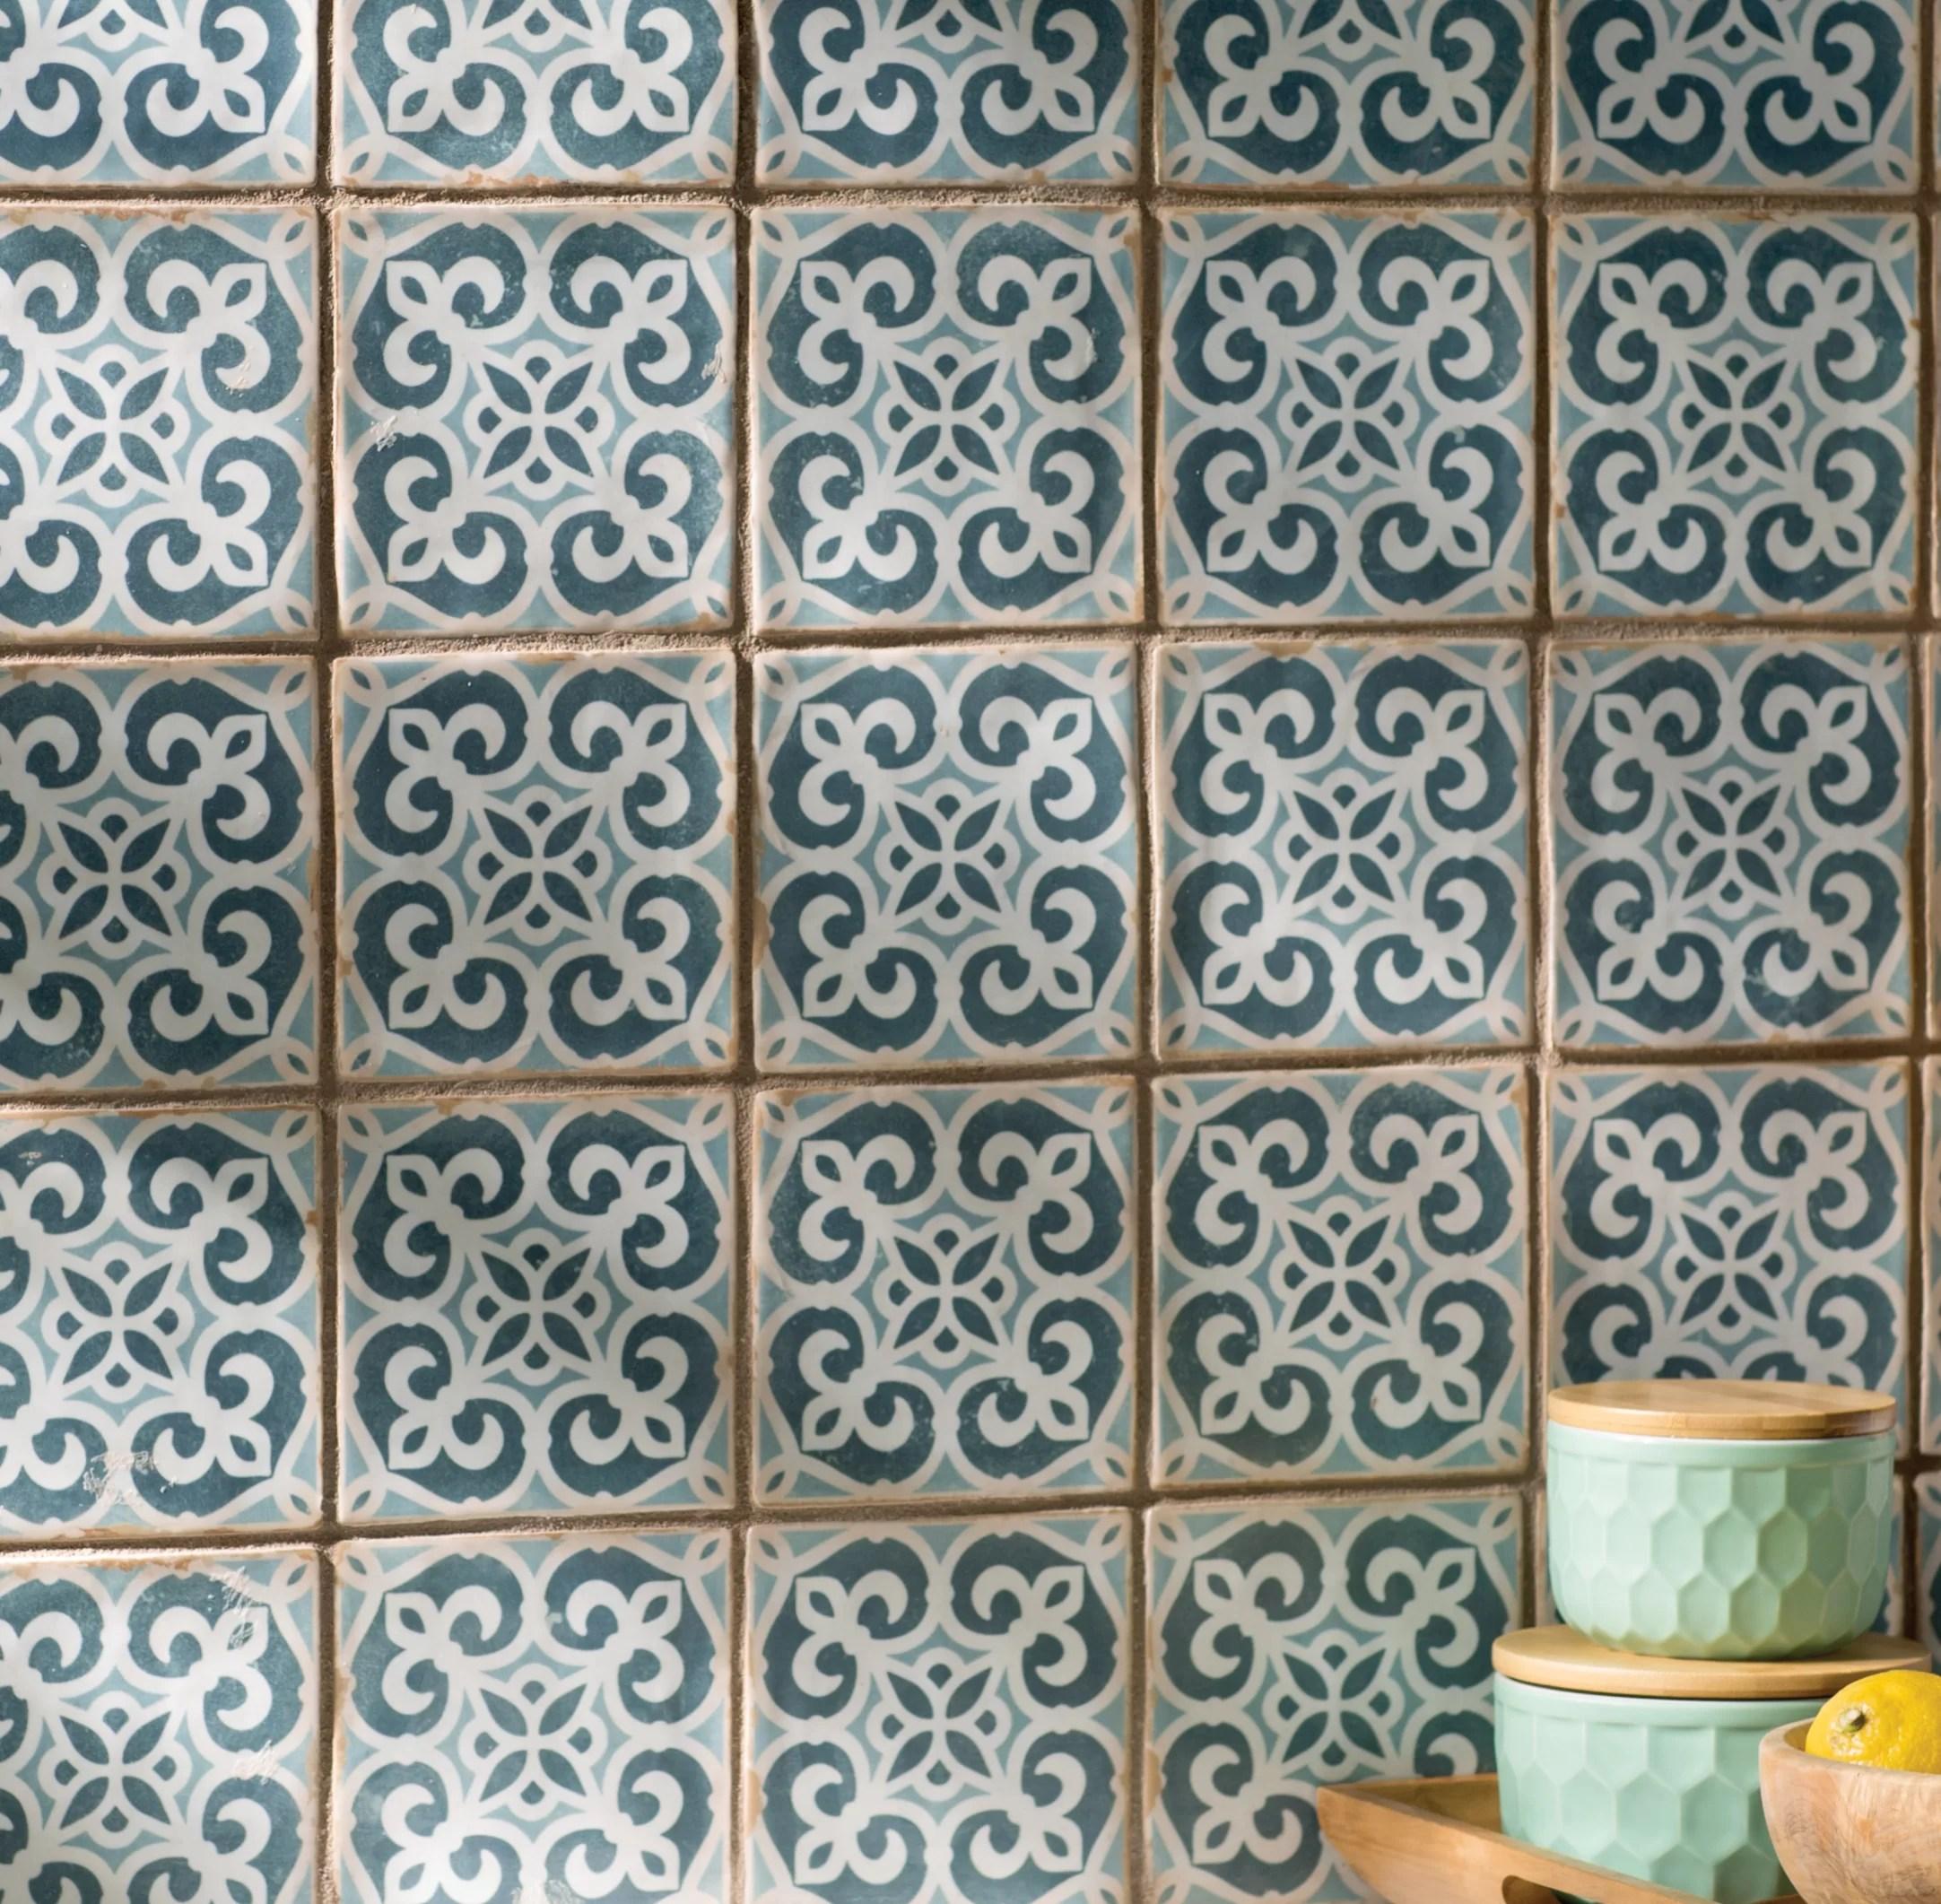 archivo 5 x 5 ceramic patterned wall floor tile